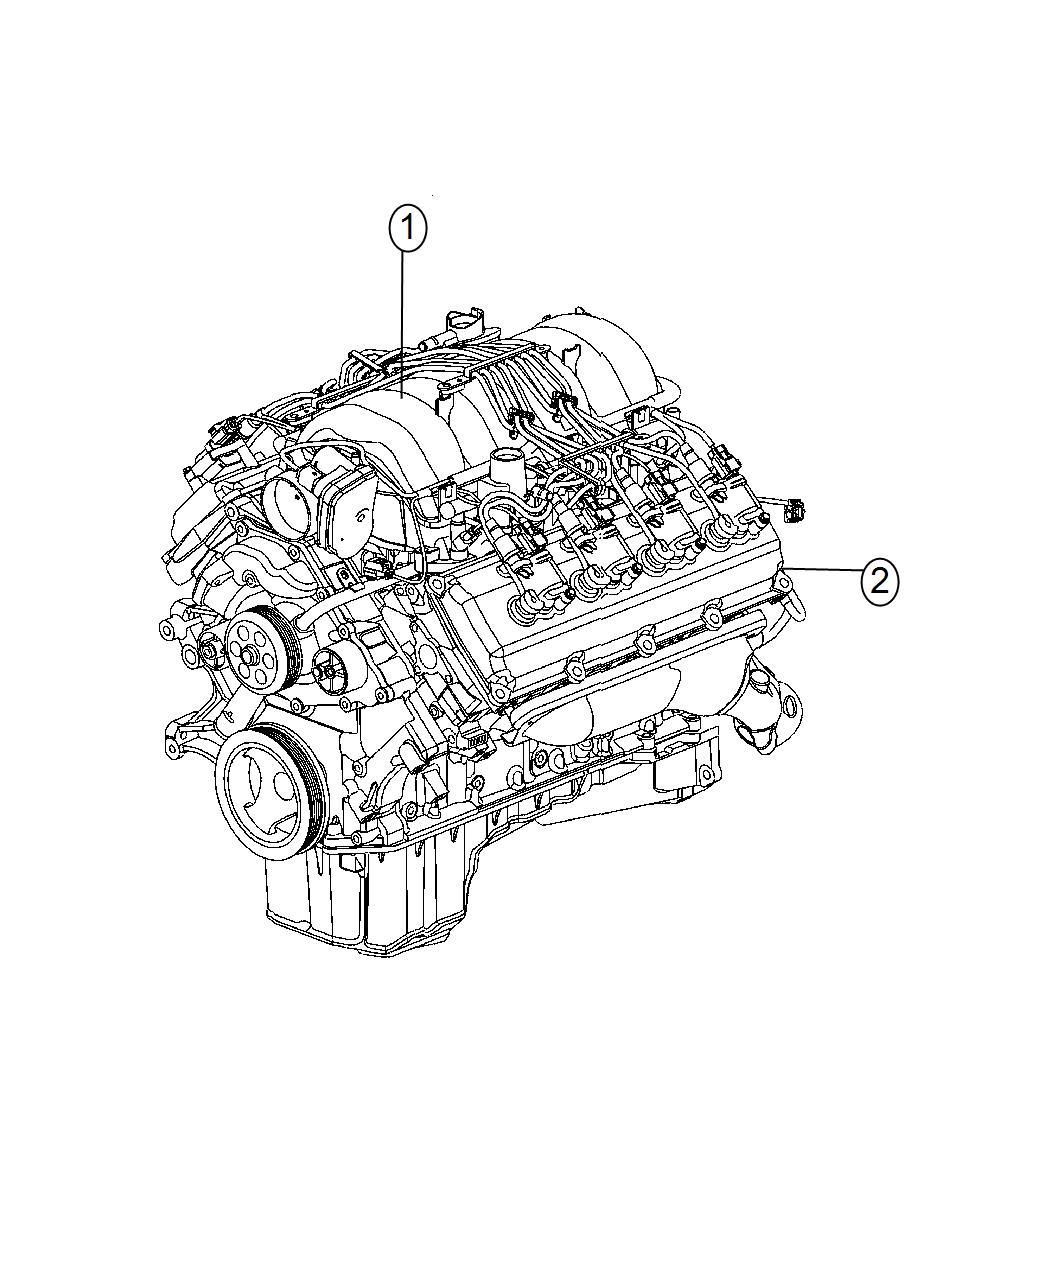 Dodge Challenger Engine Complete Mds Long Service